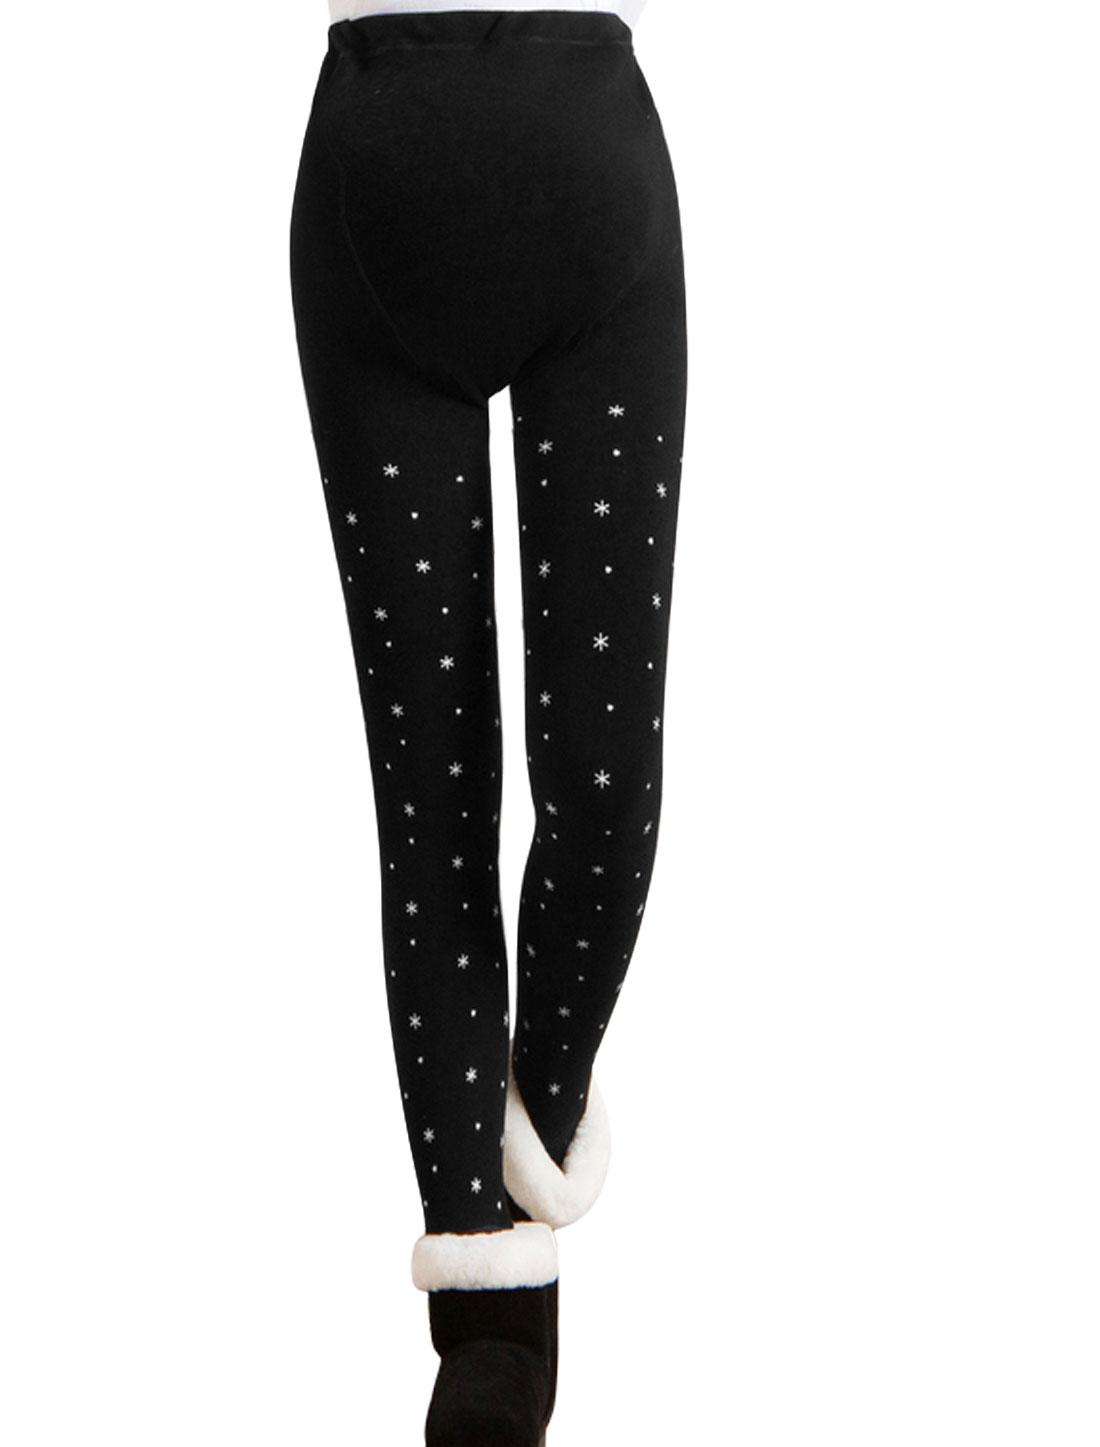 Motherhood Hearts Snowflake Print Detail Fleece Lined Stirrup Leggings White Black XS